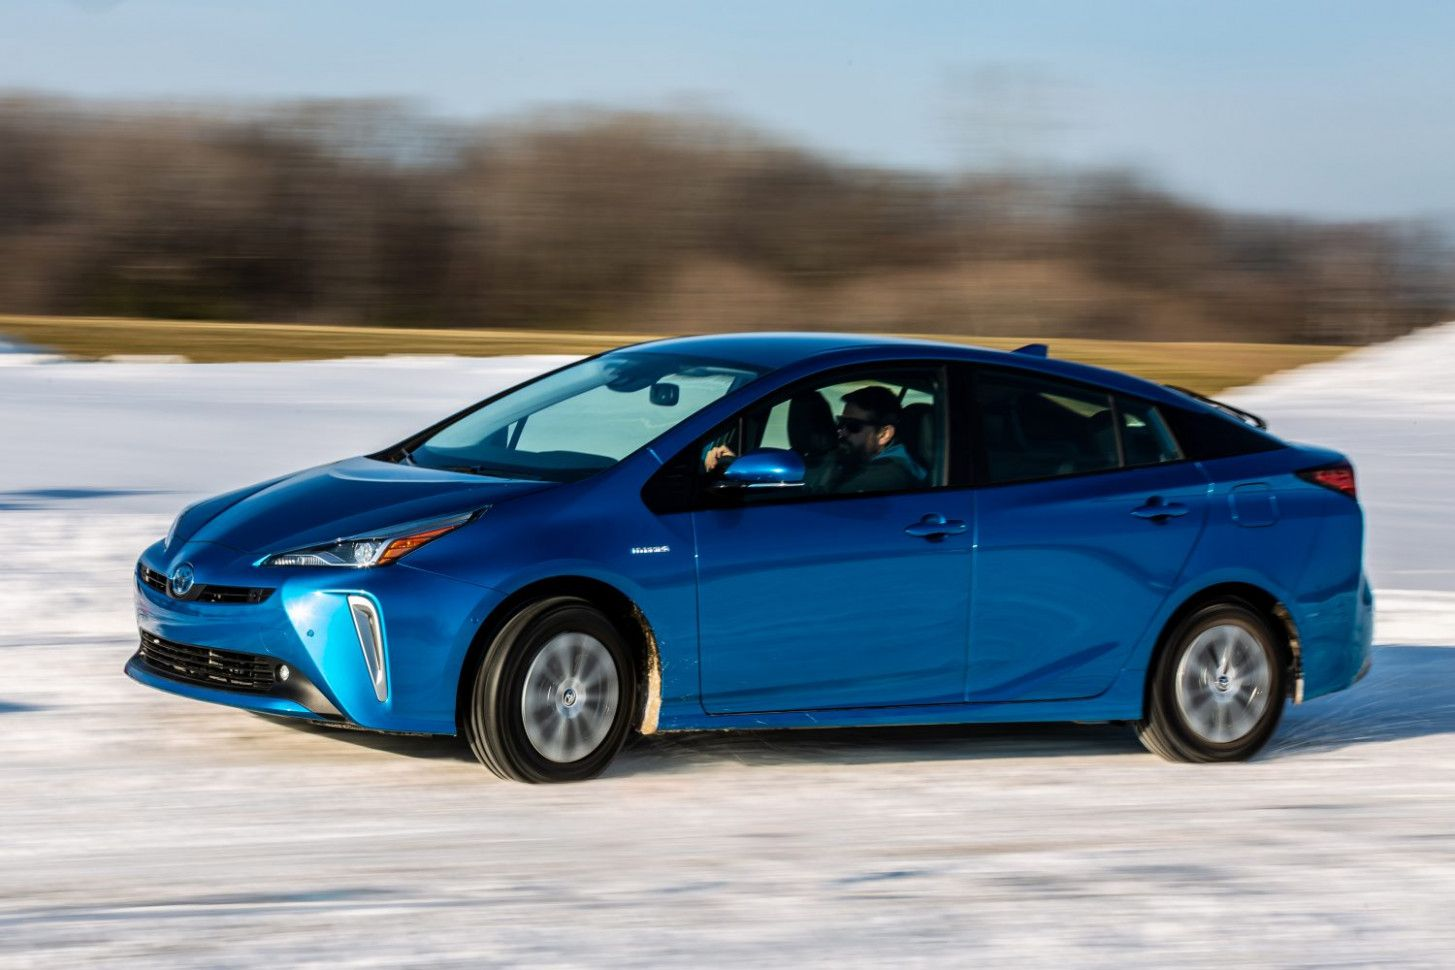 Toyota Prius V 2020 Spy Shoot In 2020 Toyota Prius